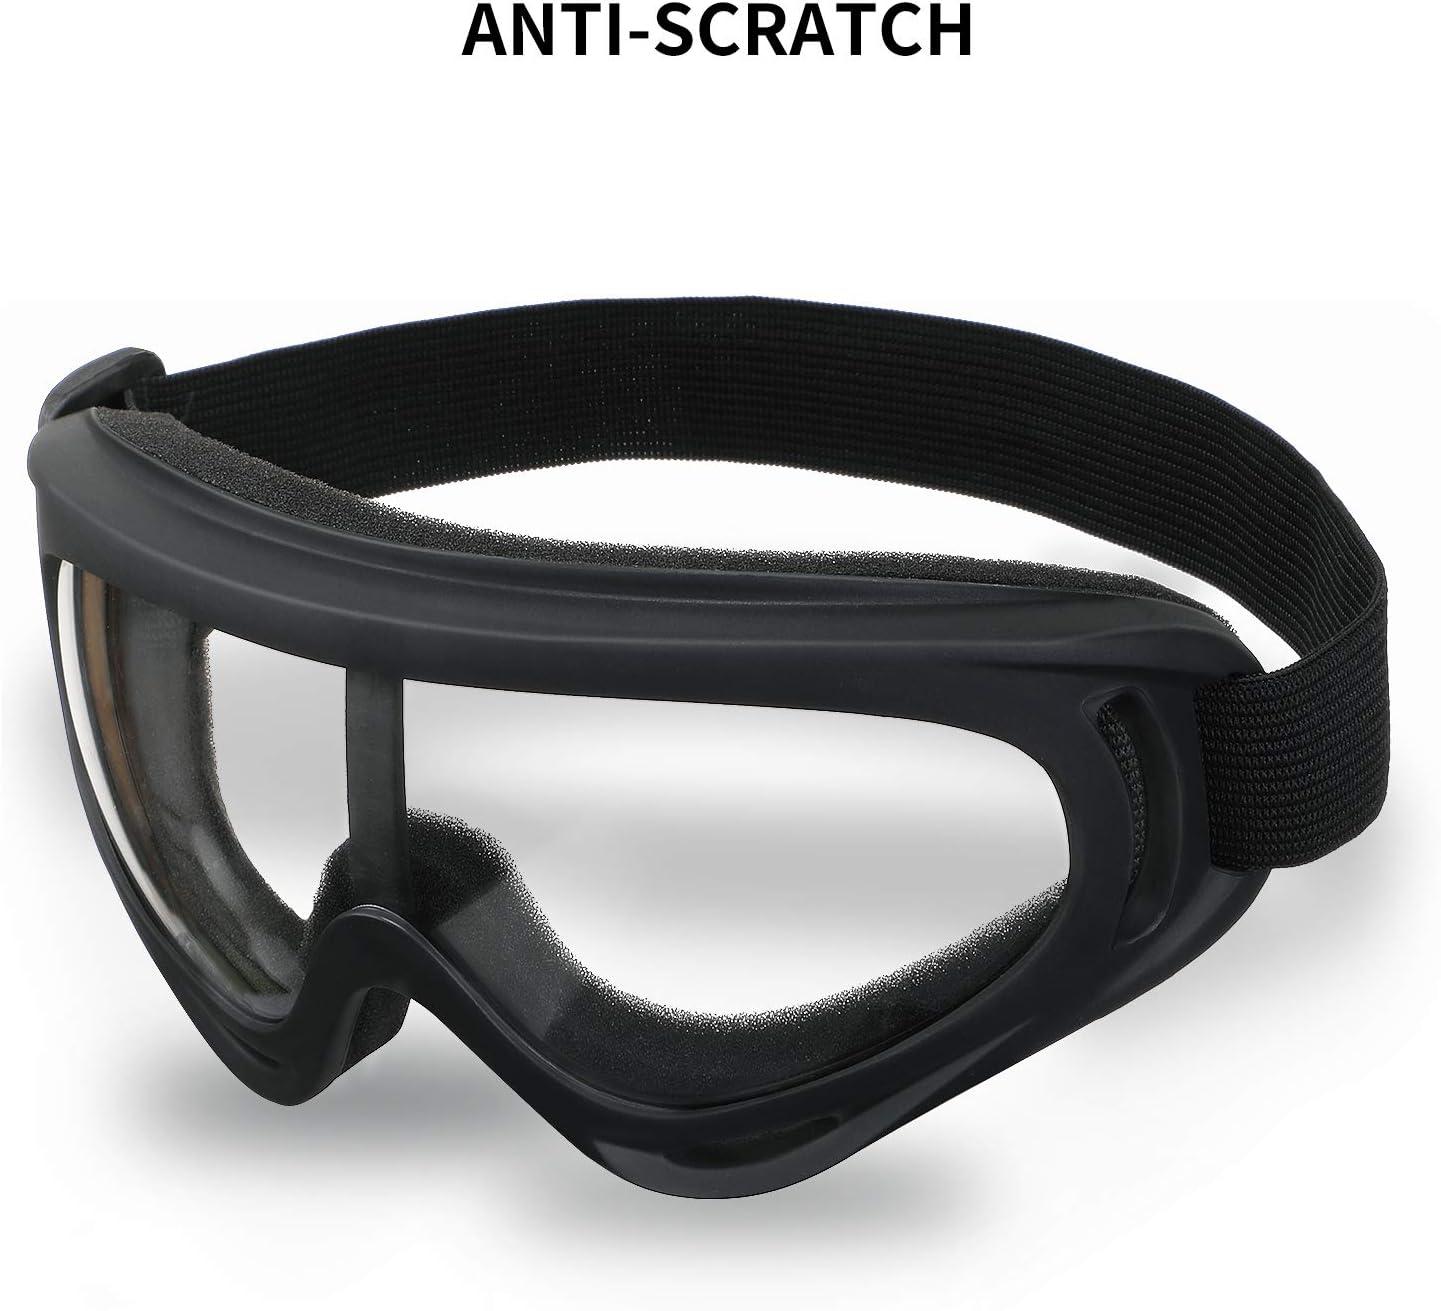 Babimax Gafas de Protección Anti-salpicaduras Amplio Campo de Visión con Banda Sellada de Silicona para Proteger Ojos(Negro)